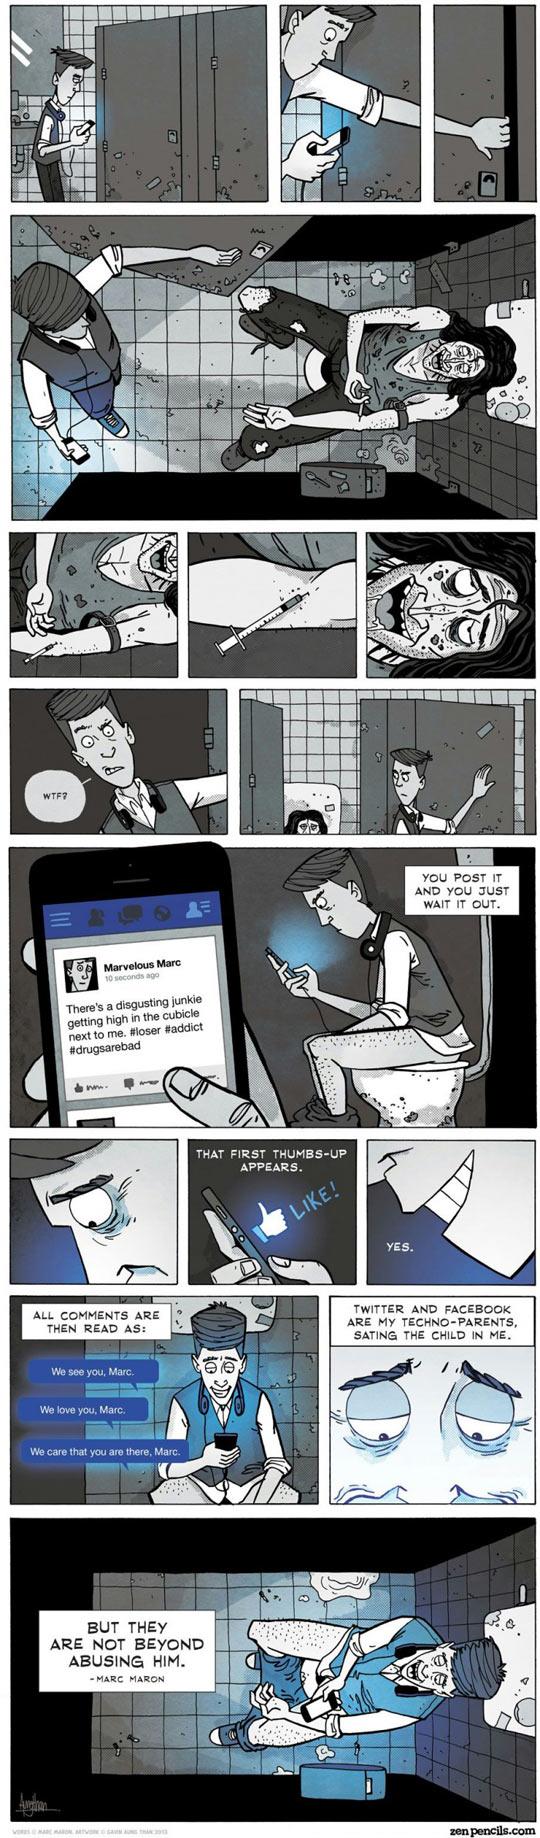 funny-comic-adults-phone-Internet-kid-screaming